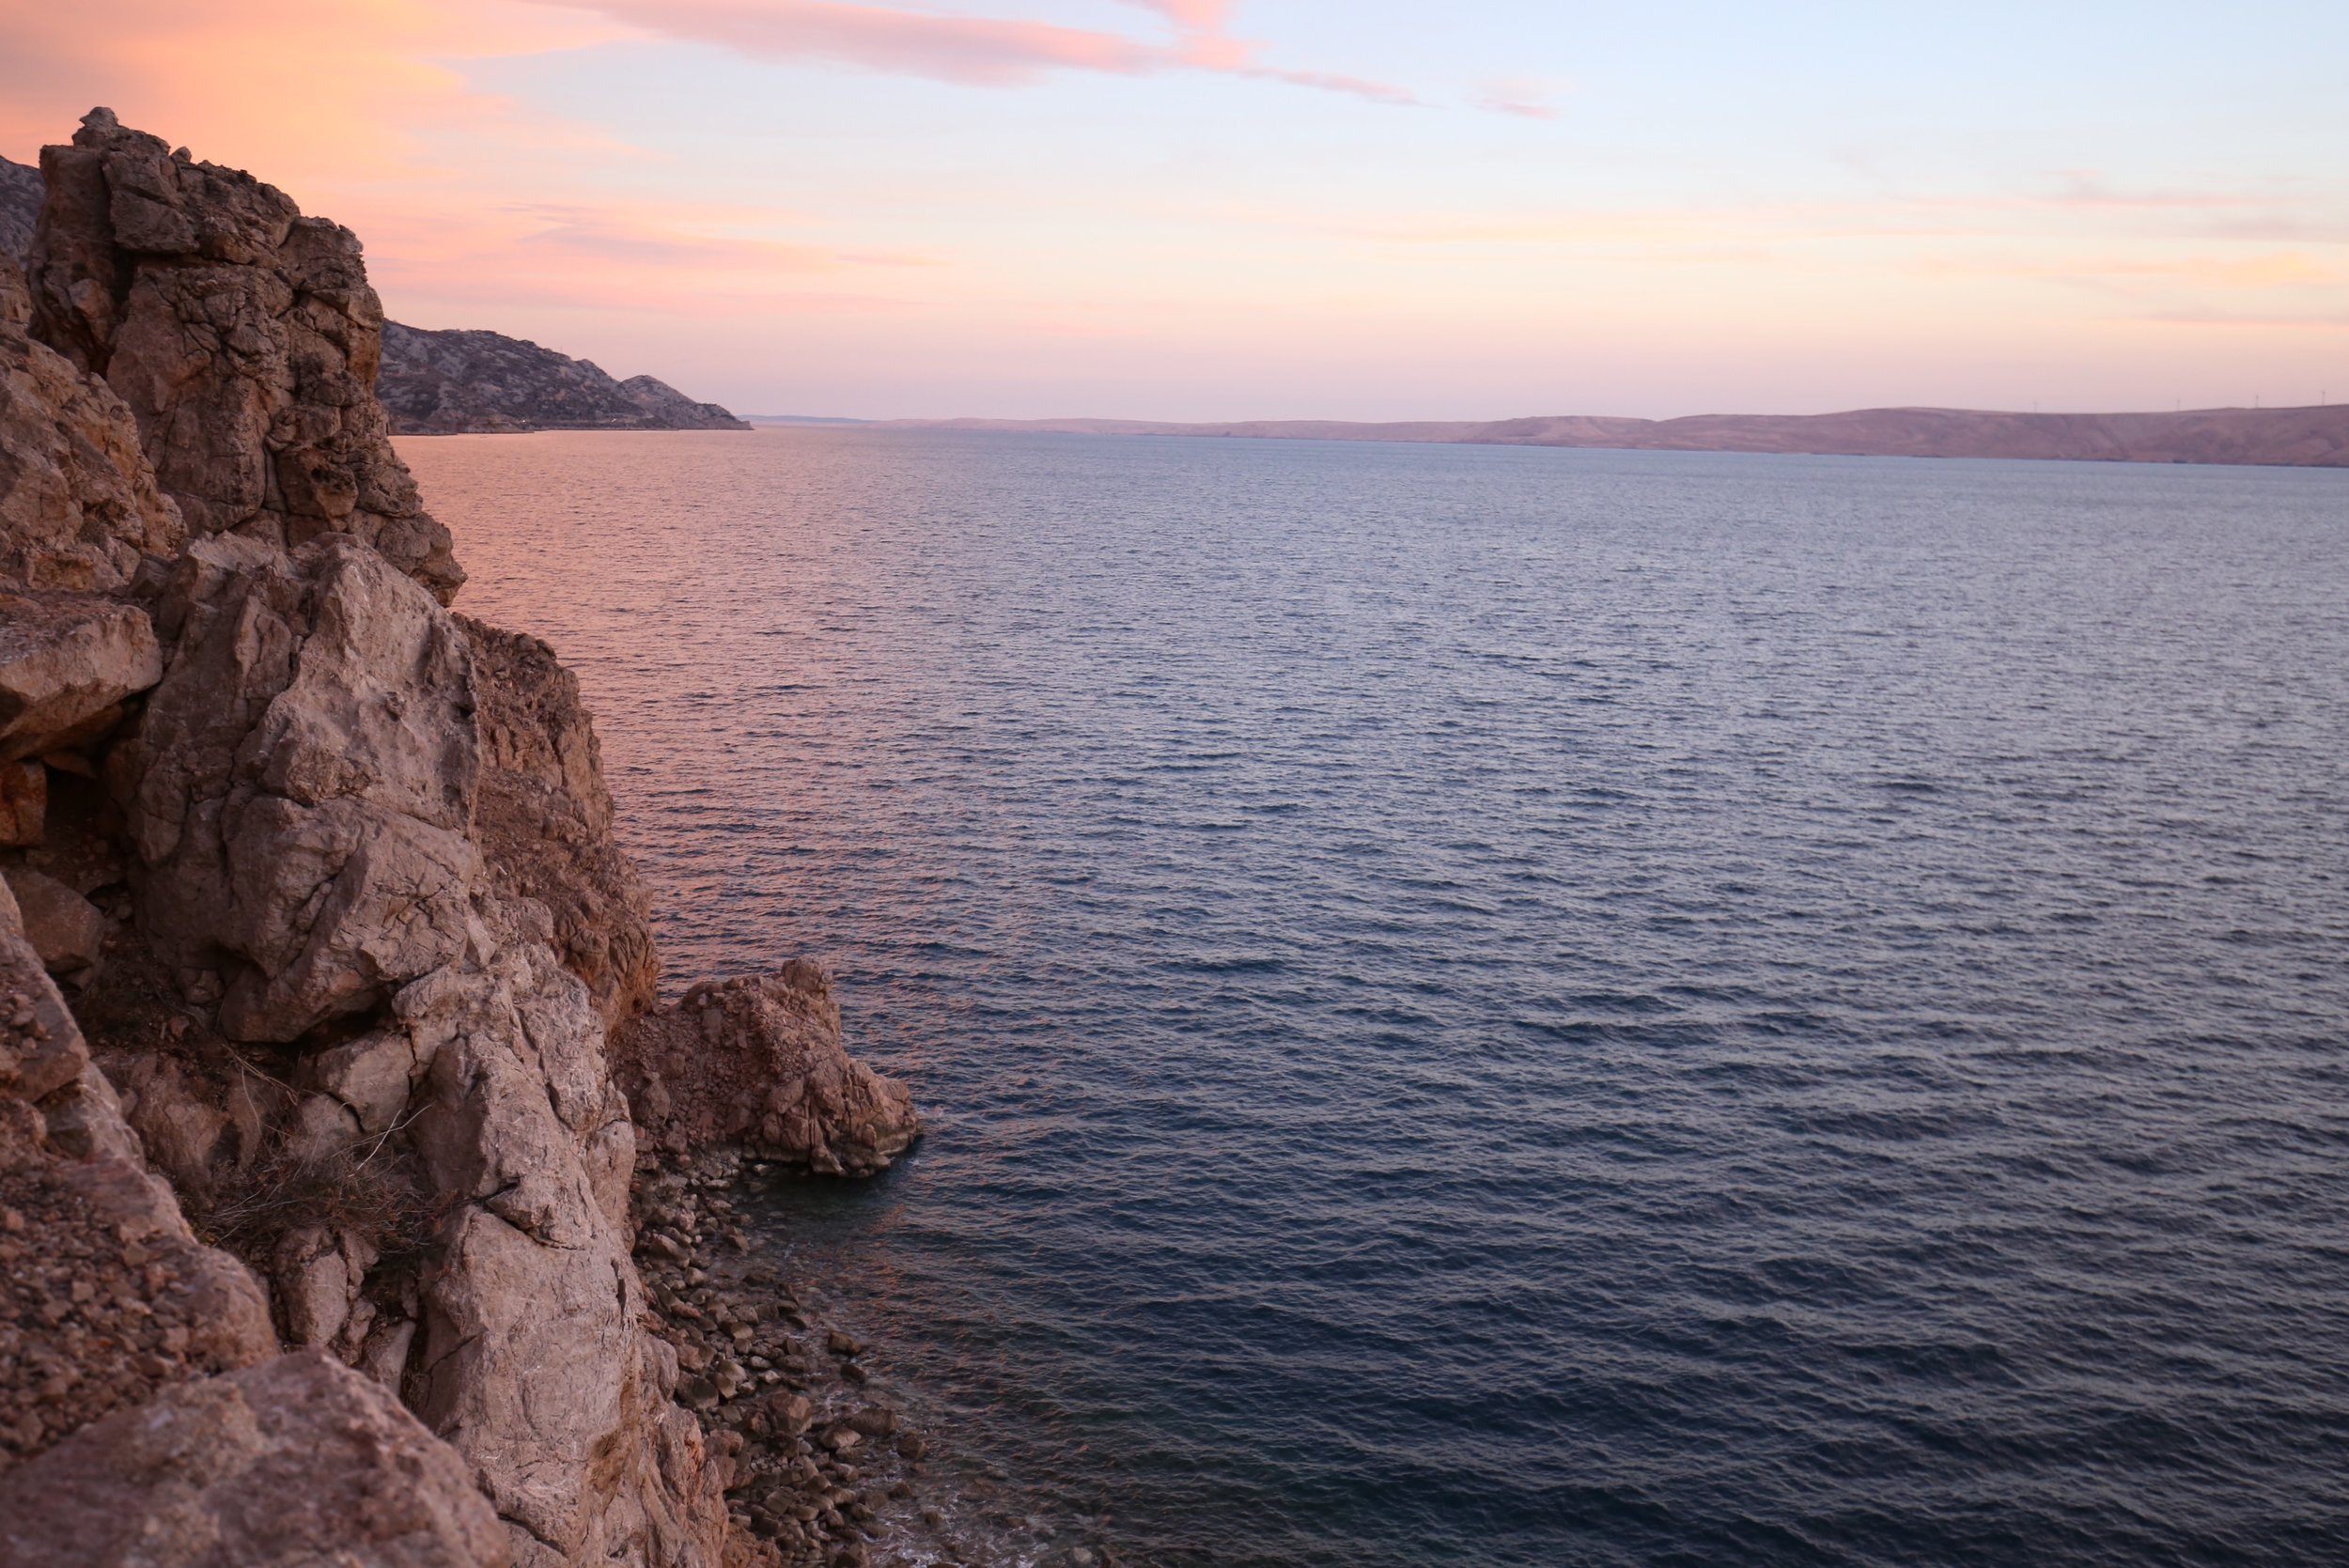 Sunset by the rocky coast of Croatia